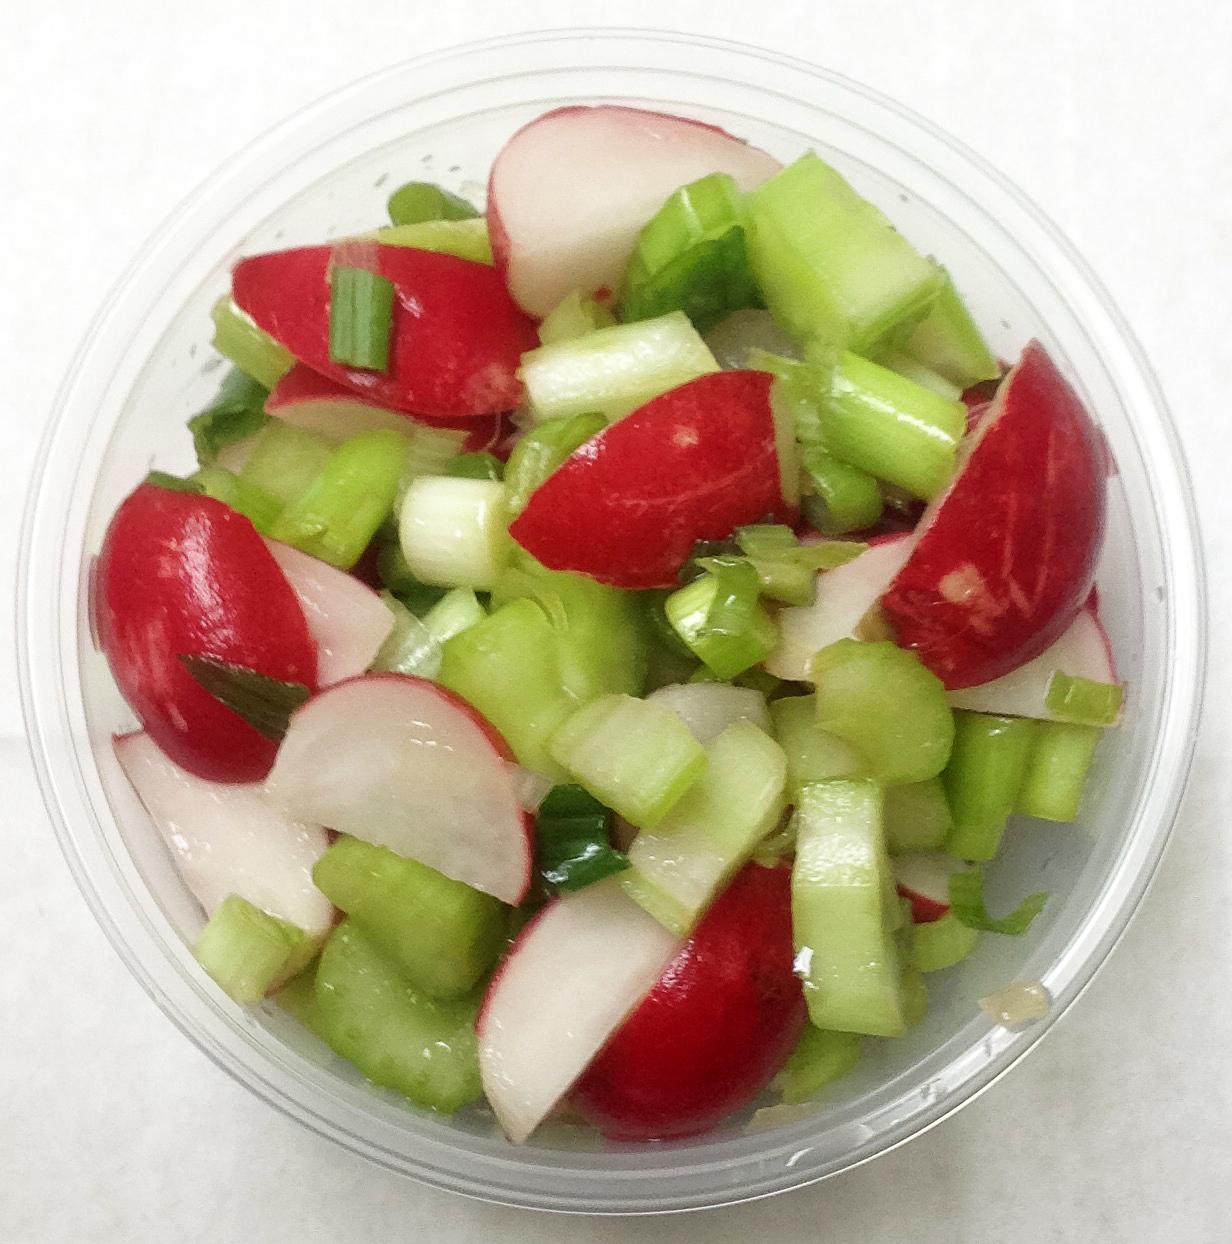 radish-and-celery.jpg